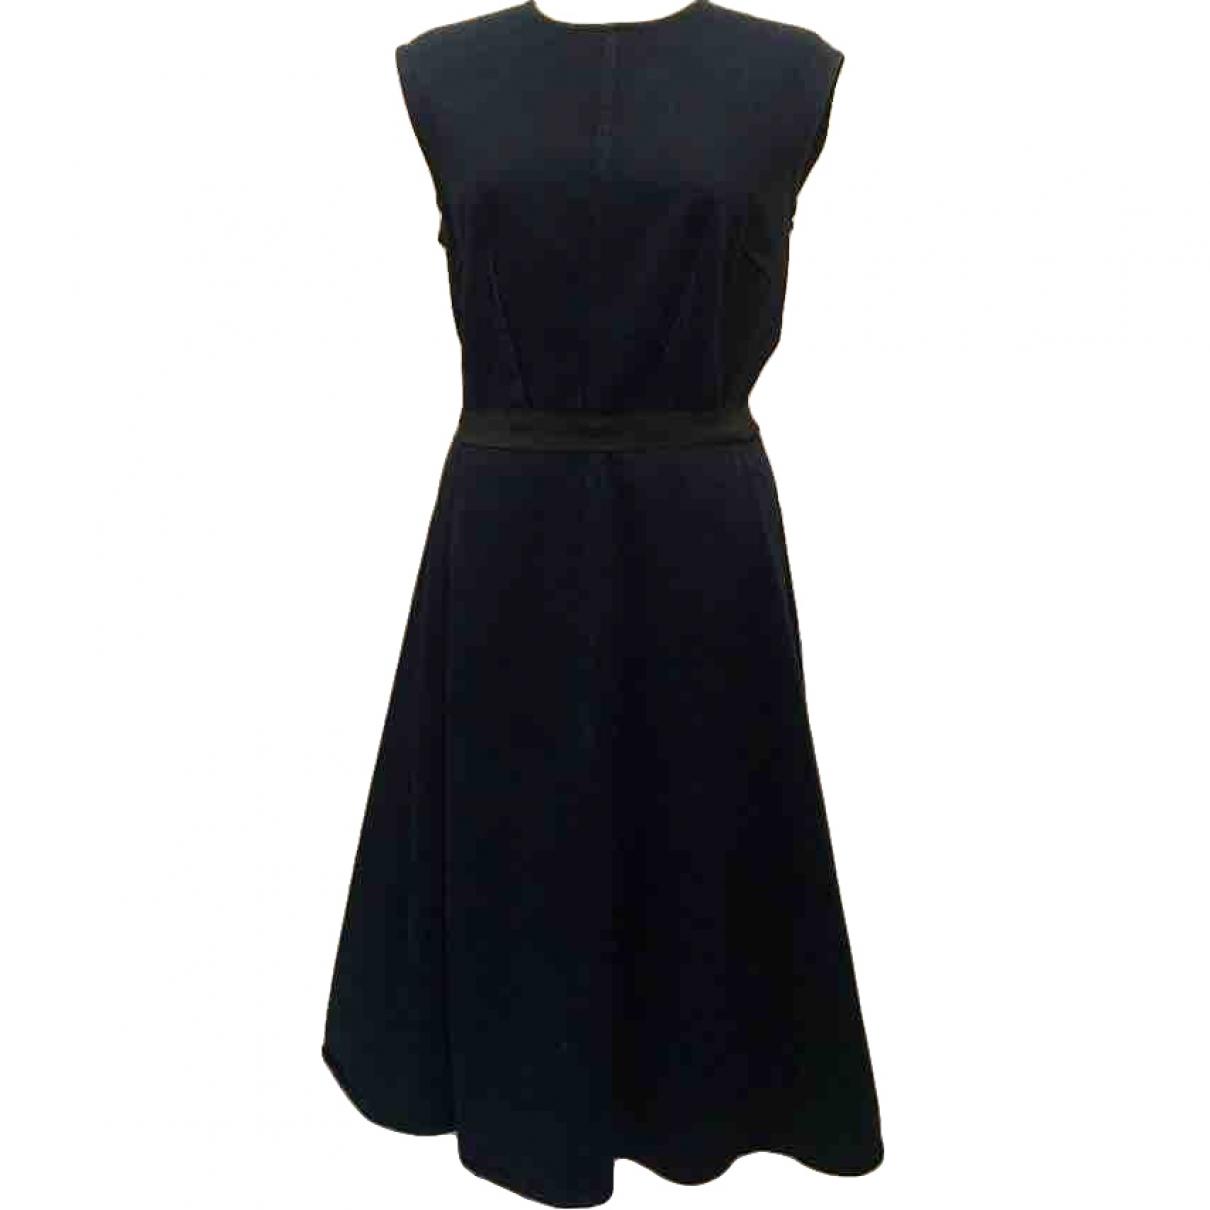 Lanvin \N Navy Cotton dress for Women 38 FR